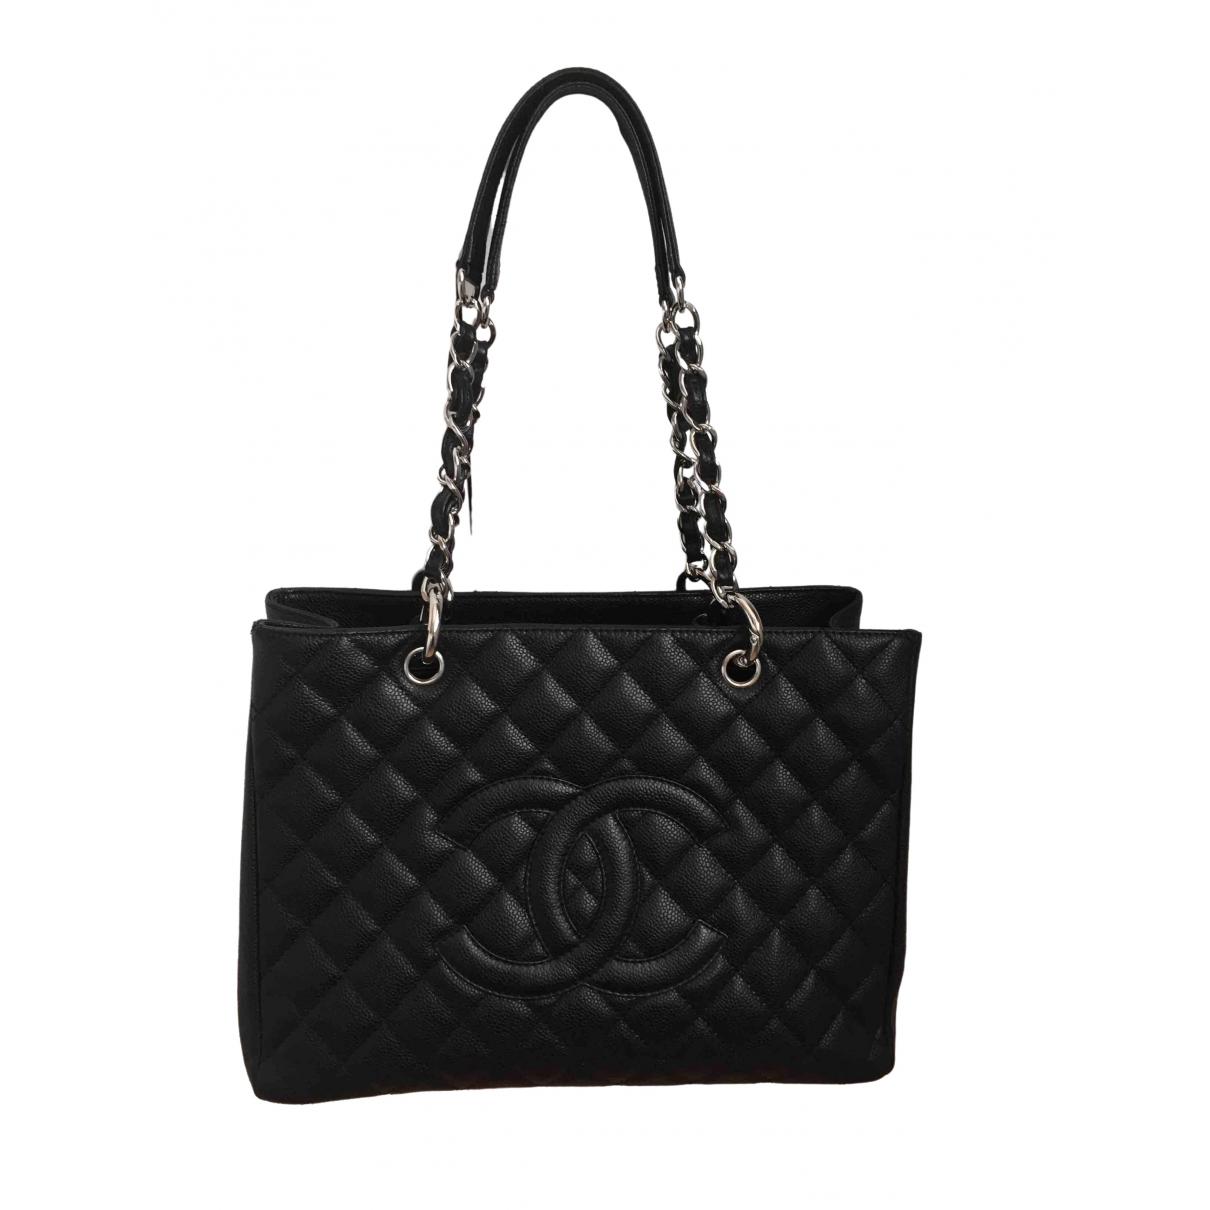 Bolso  Grand shopping de Cuero Chanel